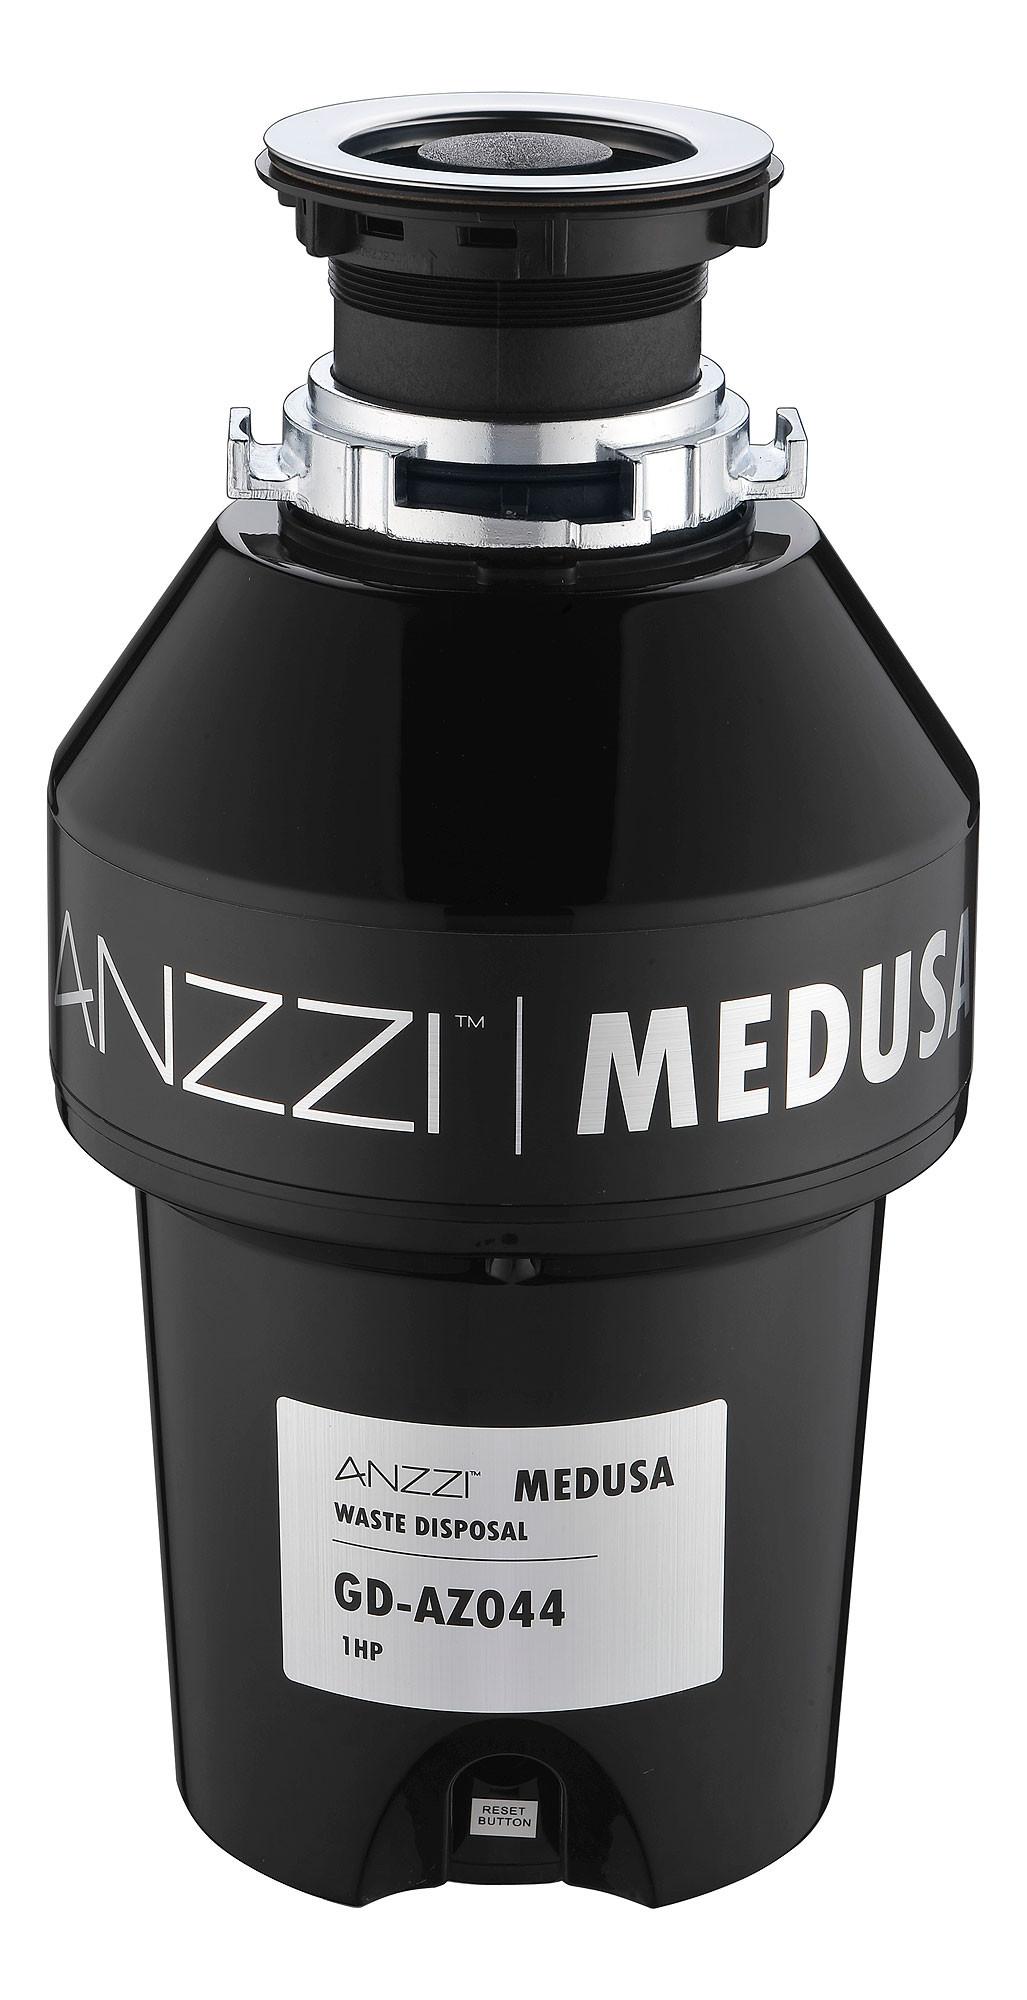 ANZZI GD-AZ044 MEDUSA 1 HP Continuous Kitchen Garbage Disposal In Black